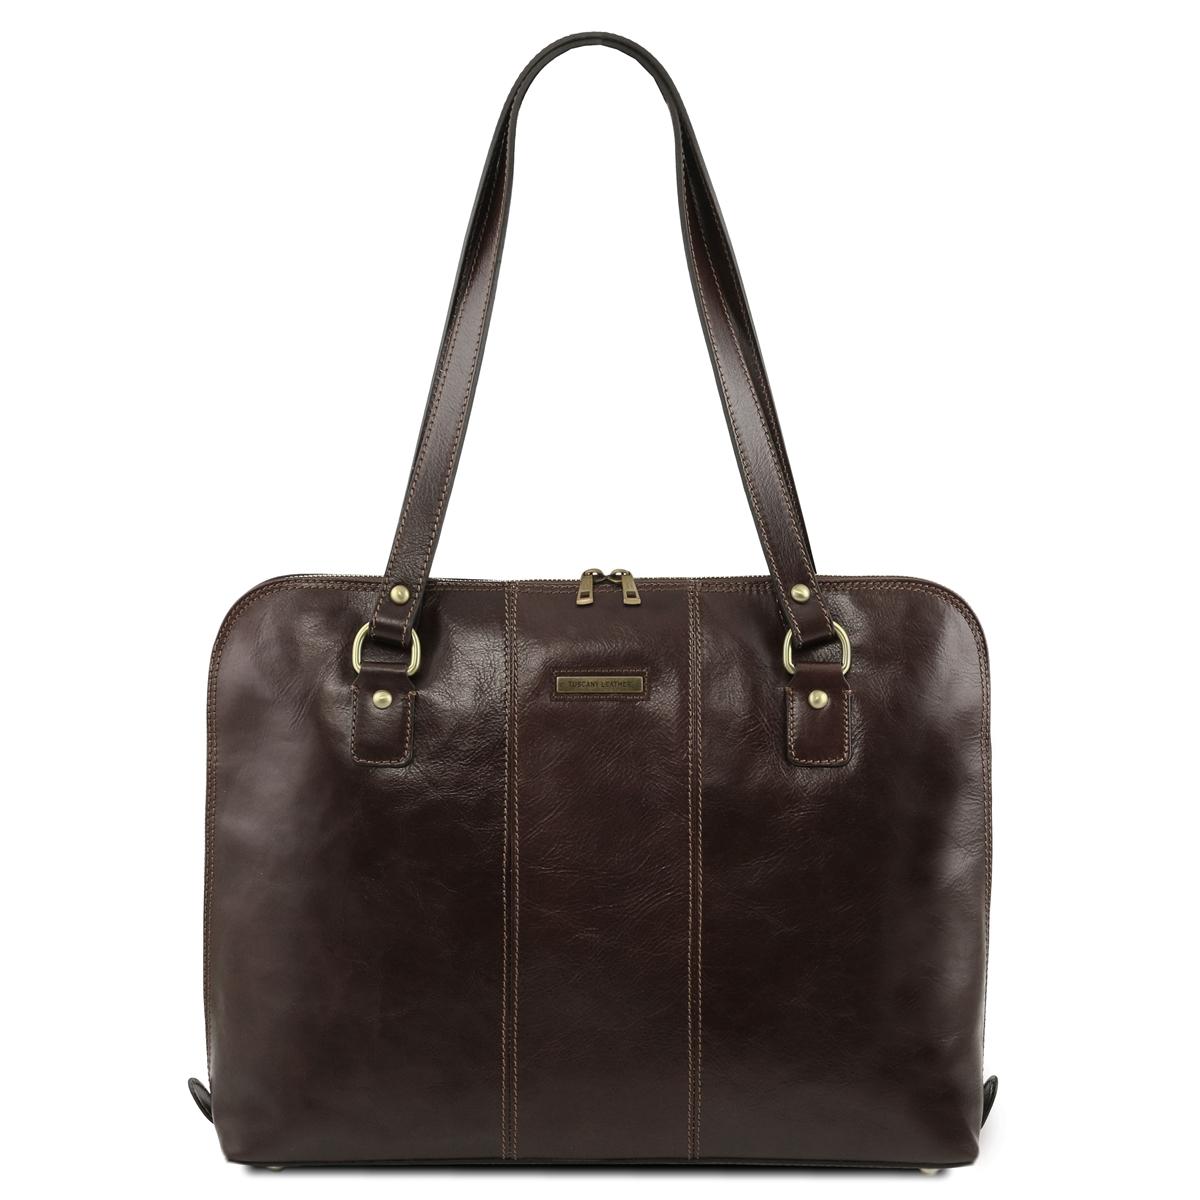 Tl141795 Ravenna Leather Laptop Bag